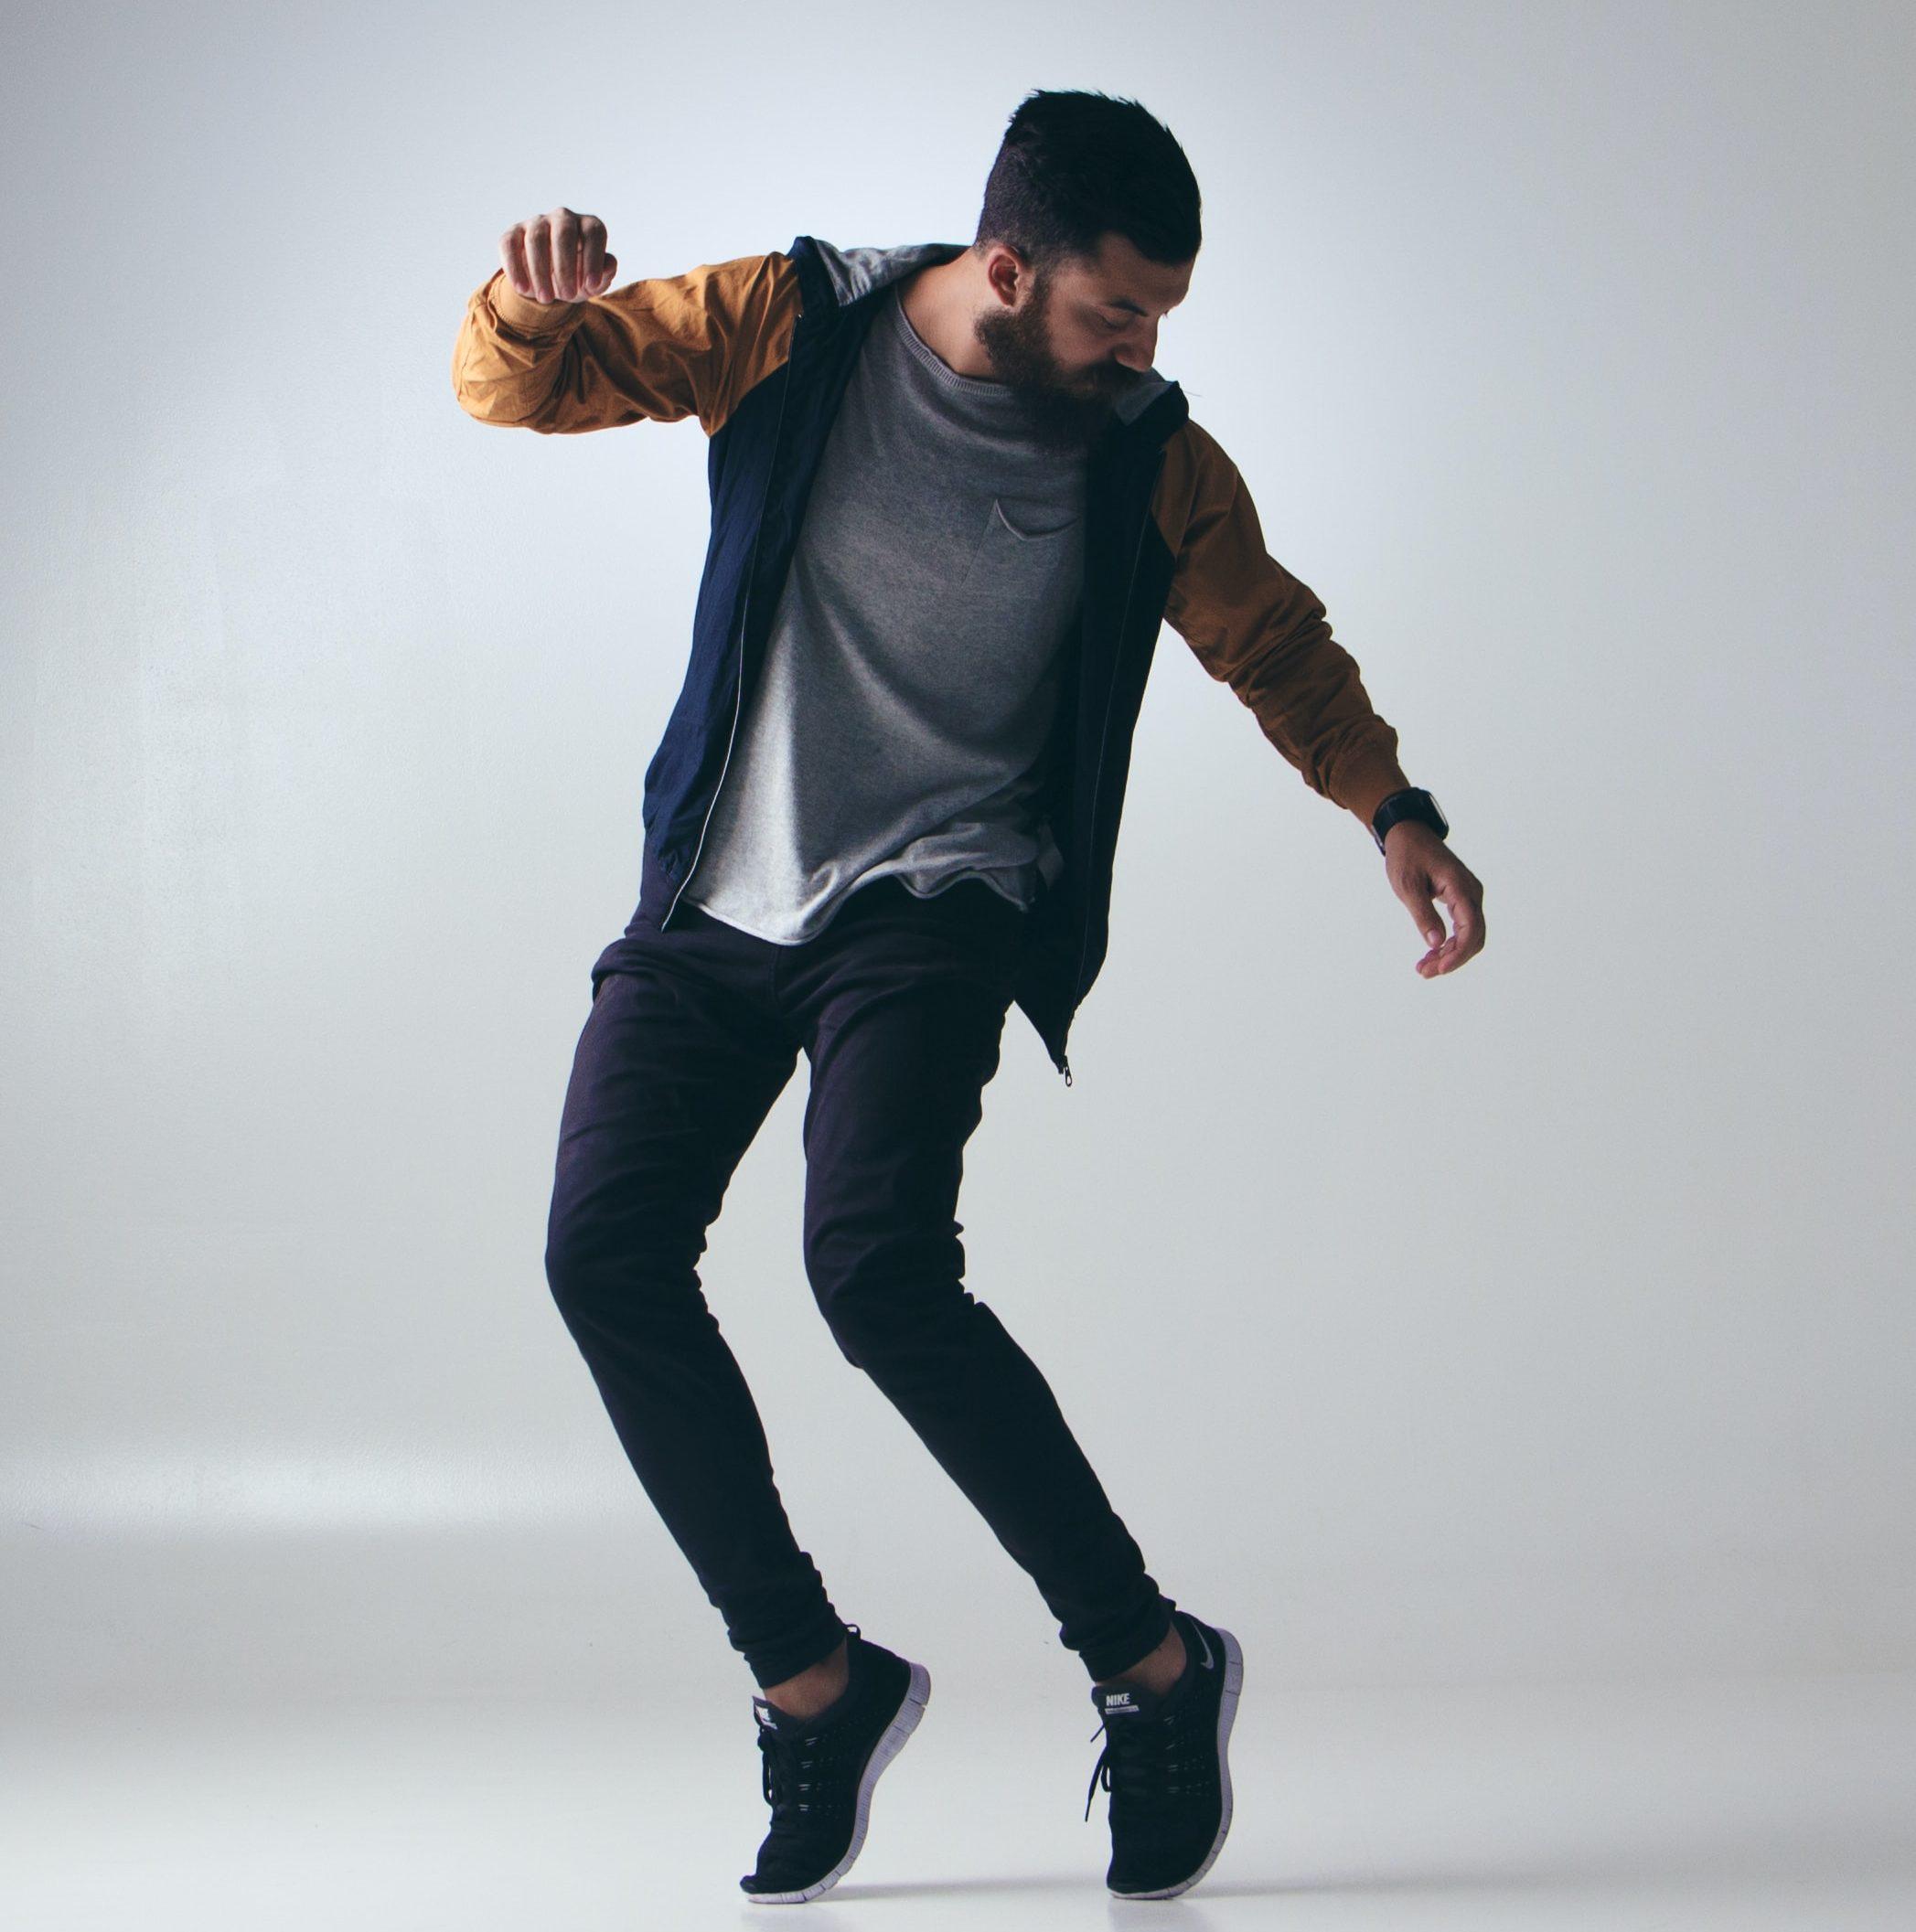 shuffle dance2